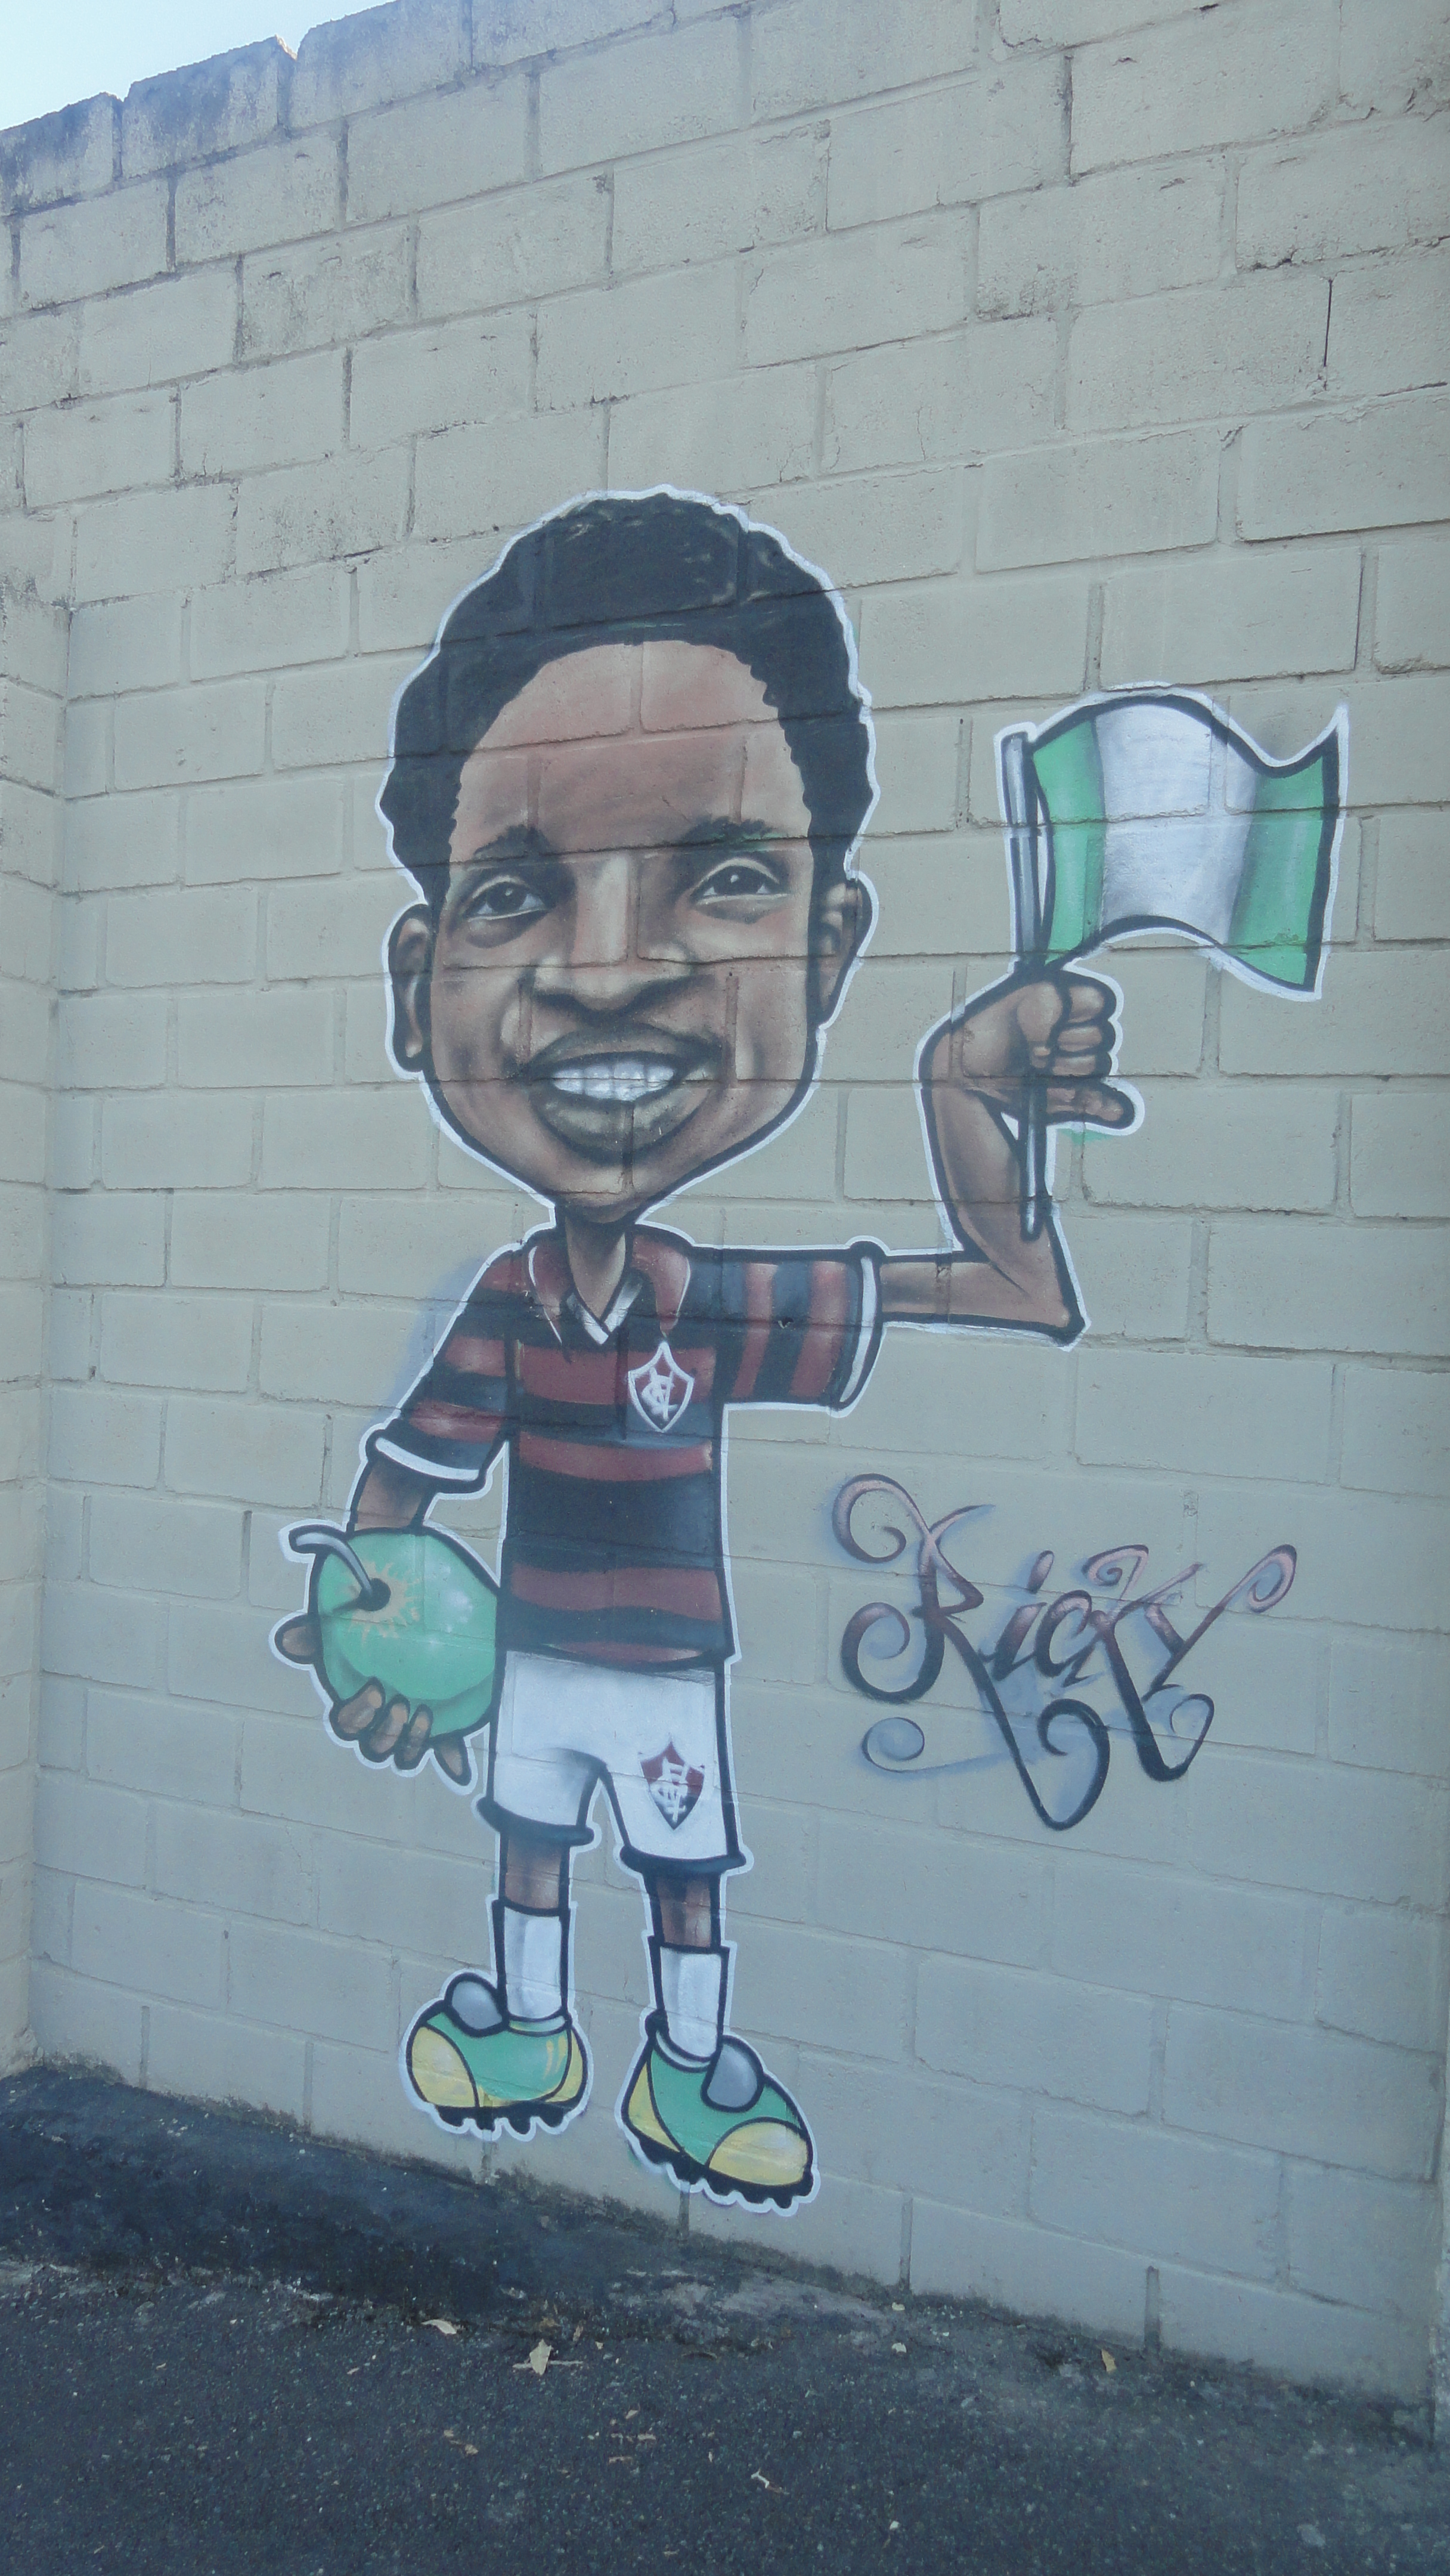 Richard Owubokiri immortalised on the wall at Vitória Club stadium in Salvador